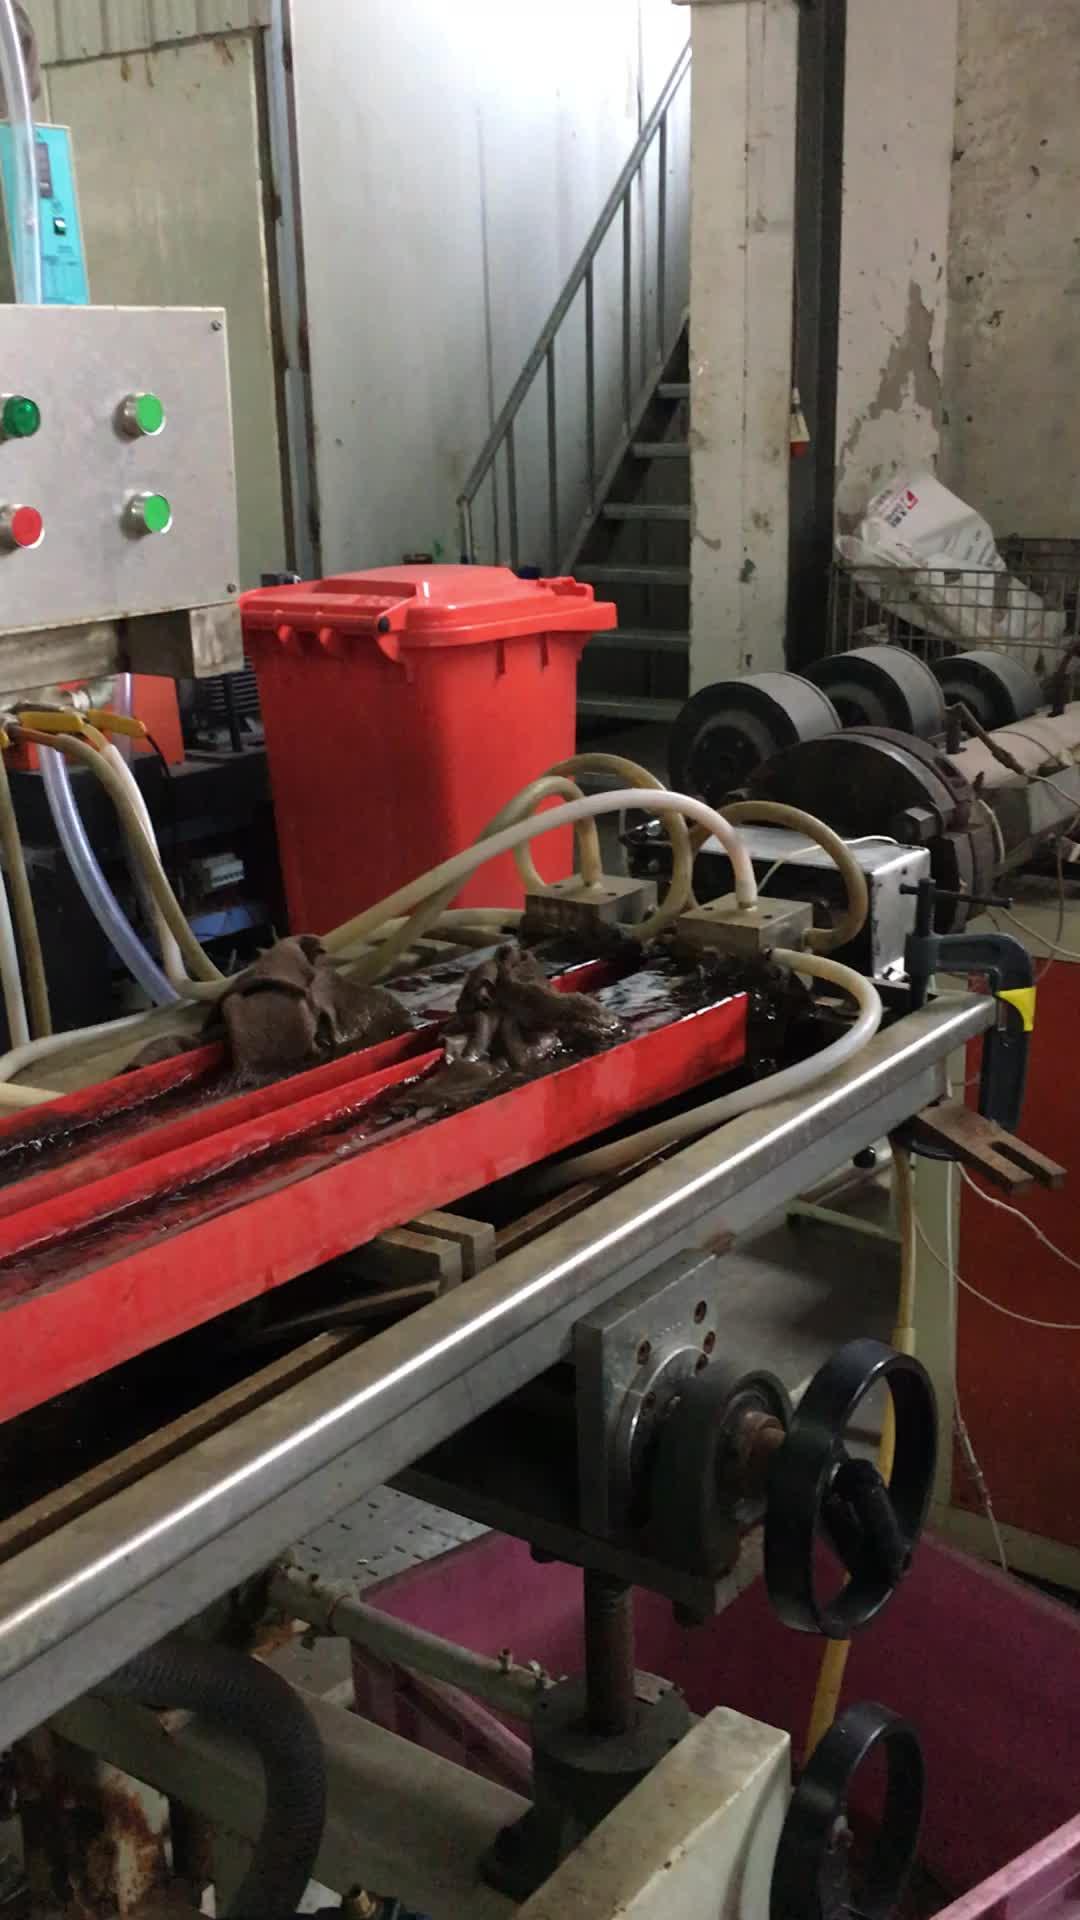 Polikarbonat kapak led difüzör led şerit işık difüzör kapak PC Ekstrüzyon Kapak